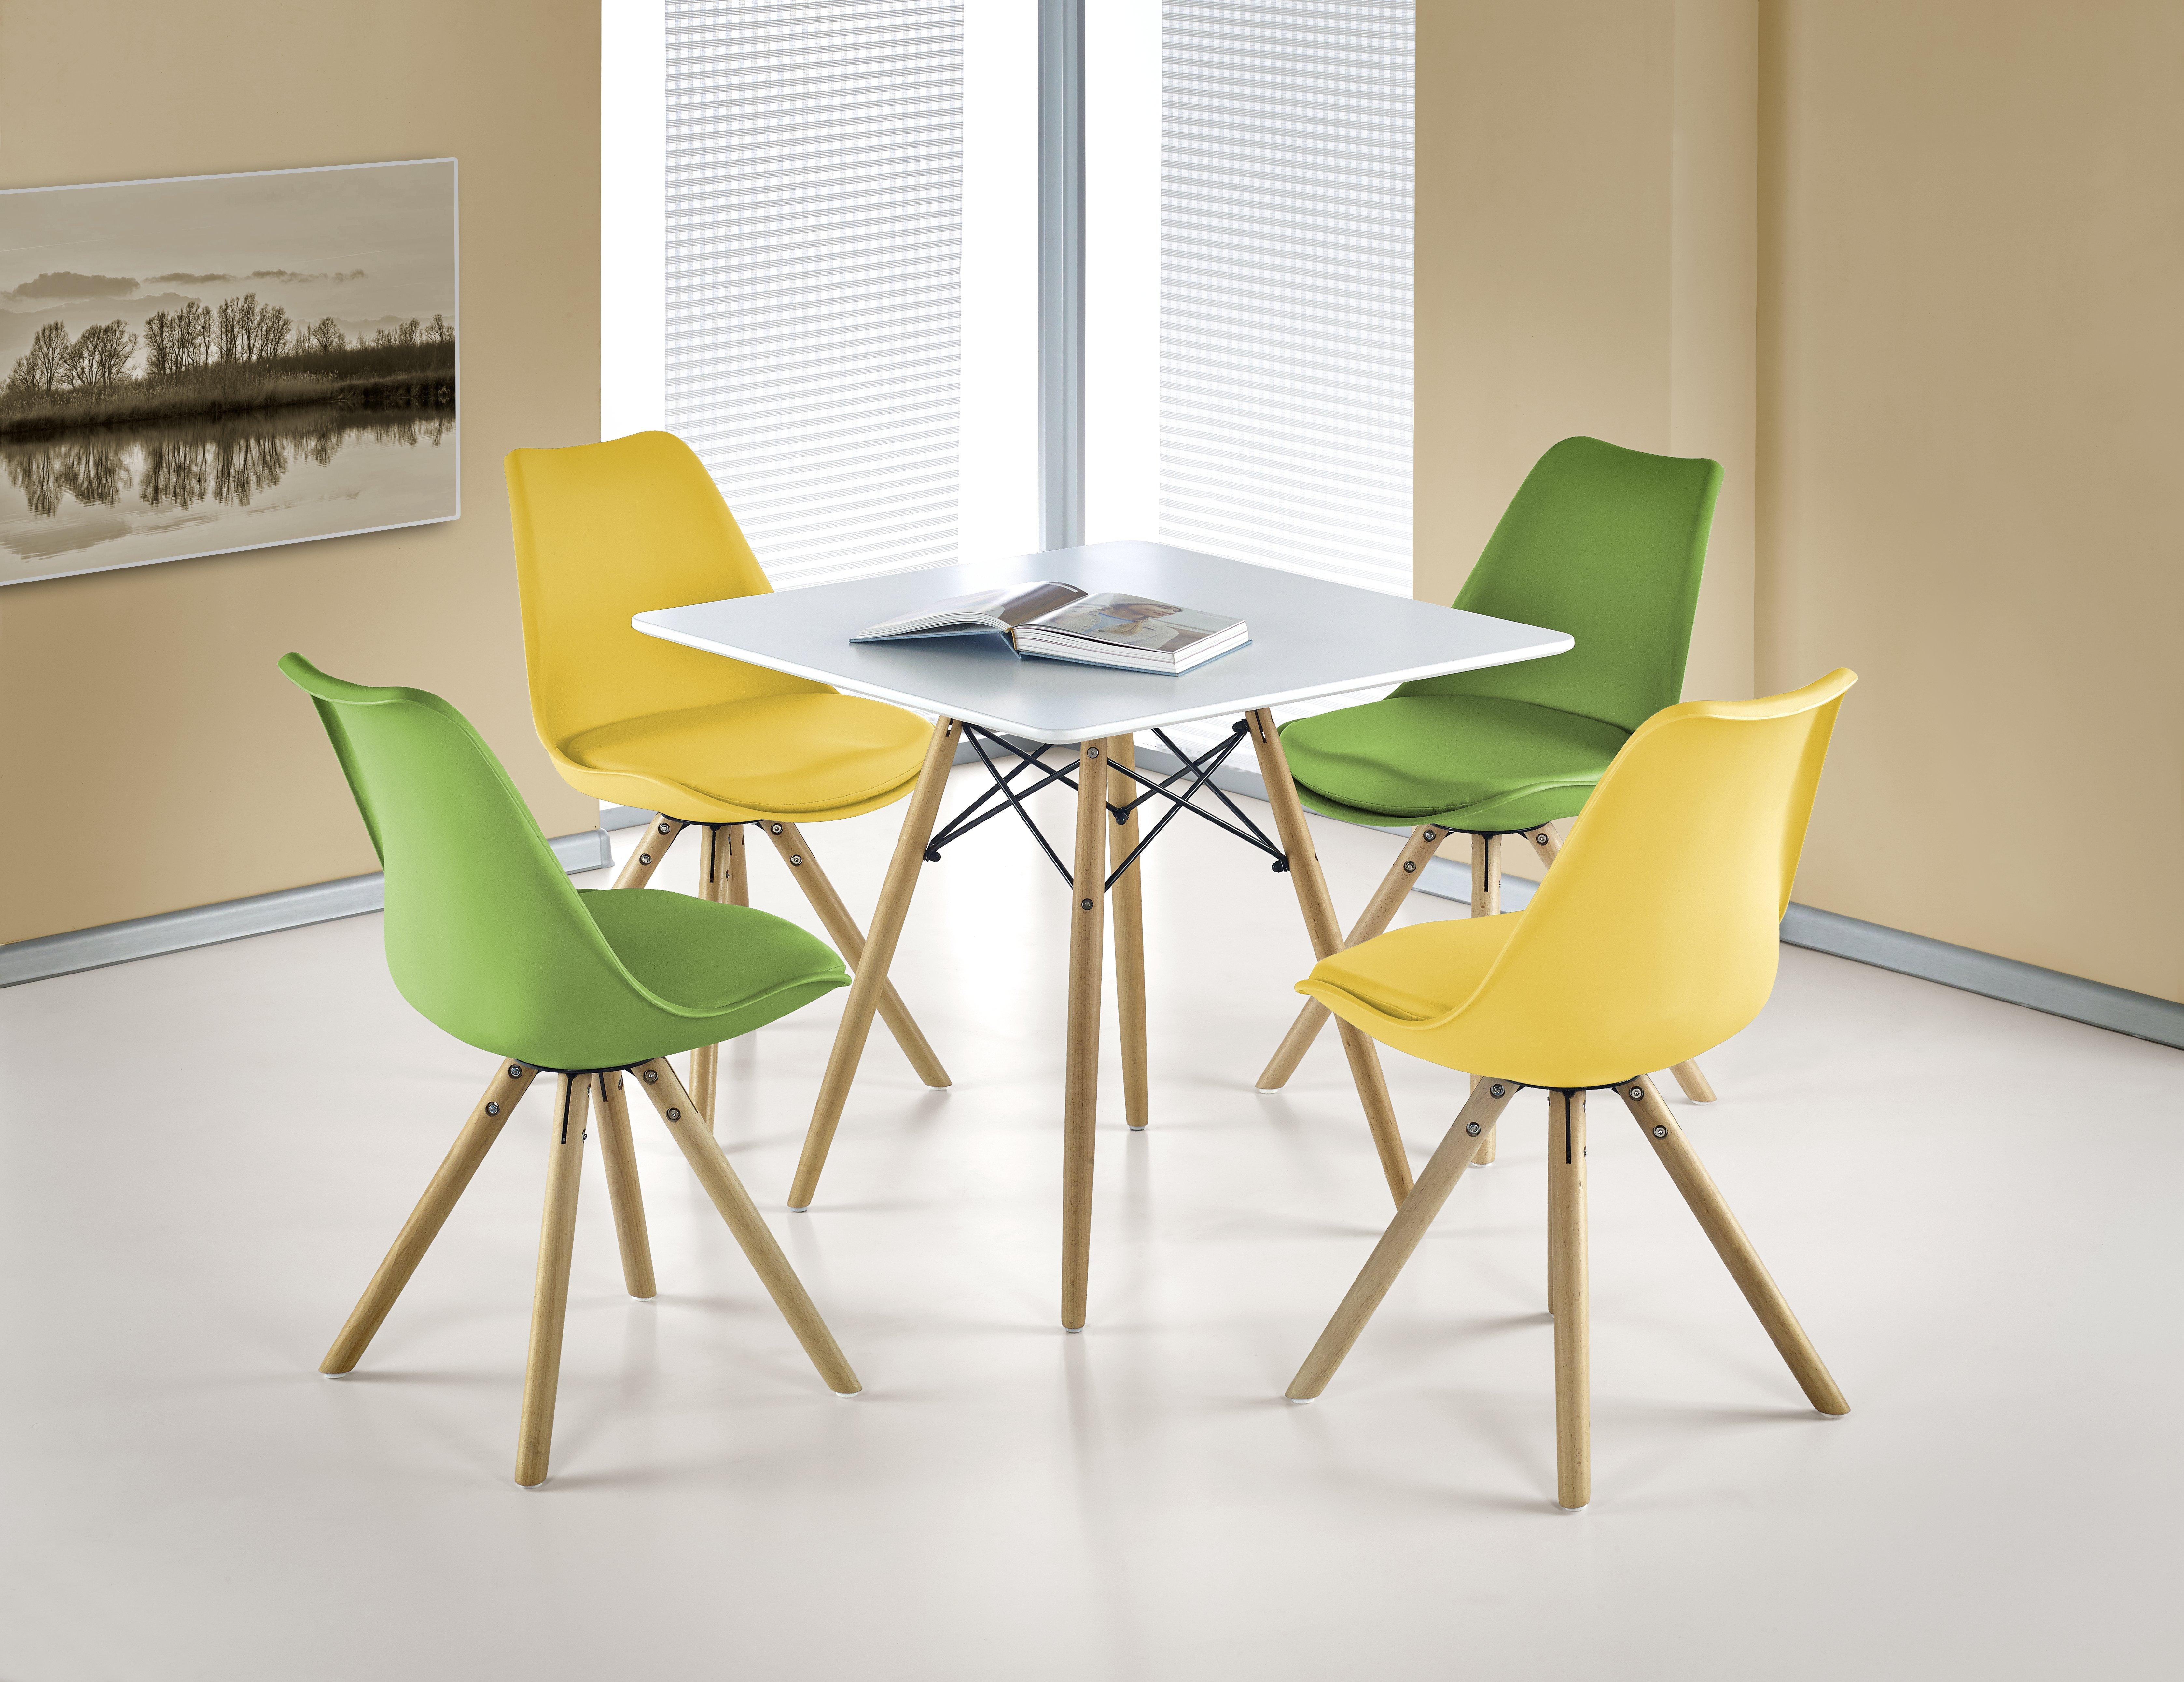 Jedálenský stôl - Halmar - Prometheus kwadrat (pre 4 osoby)